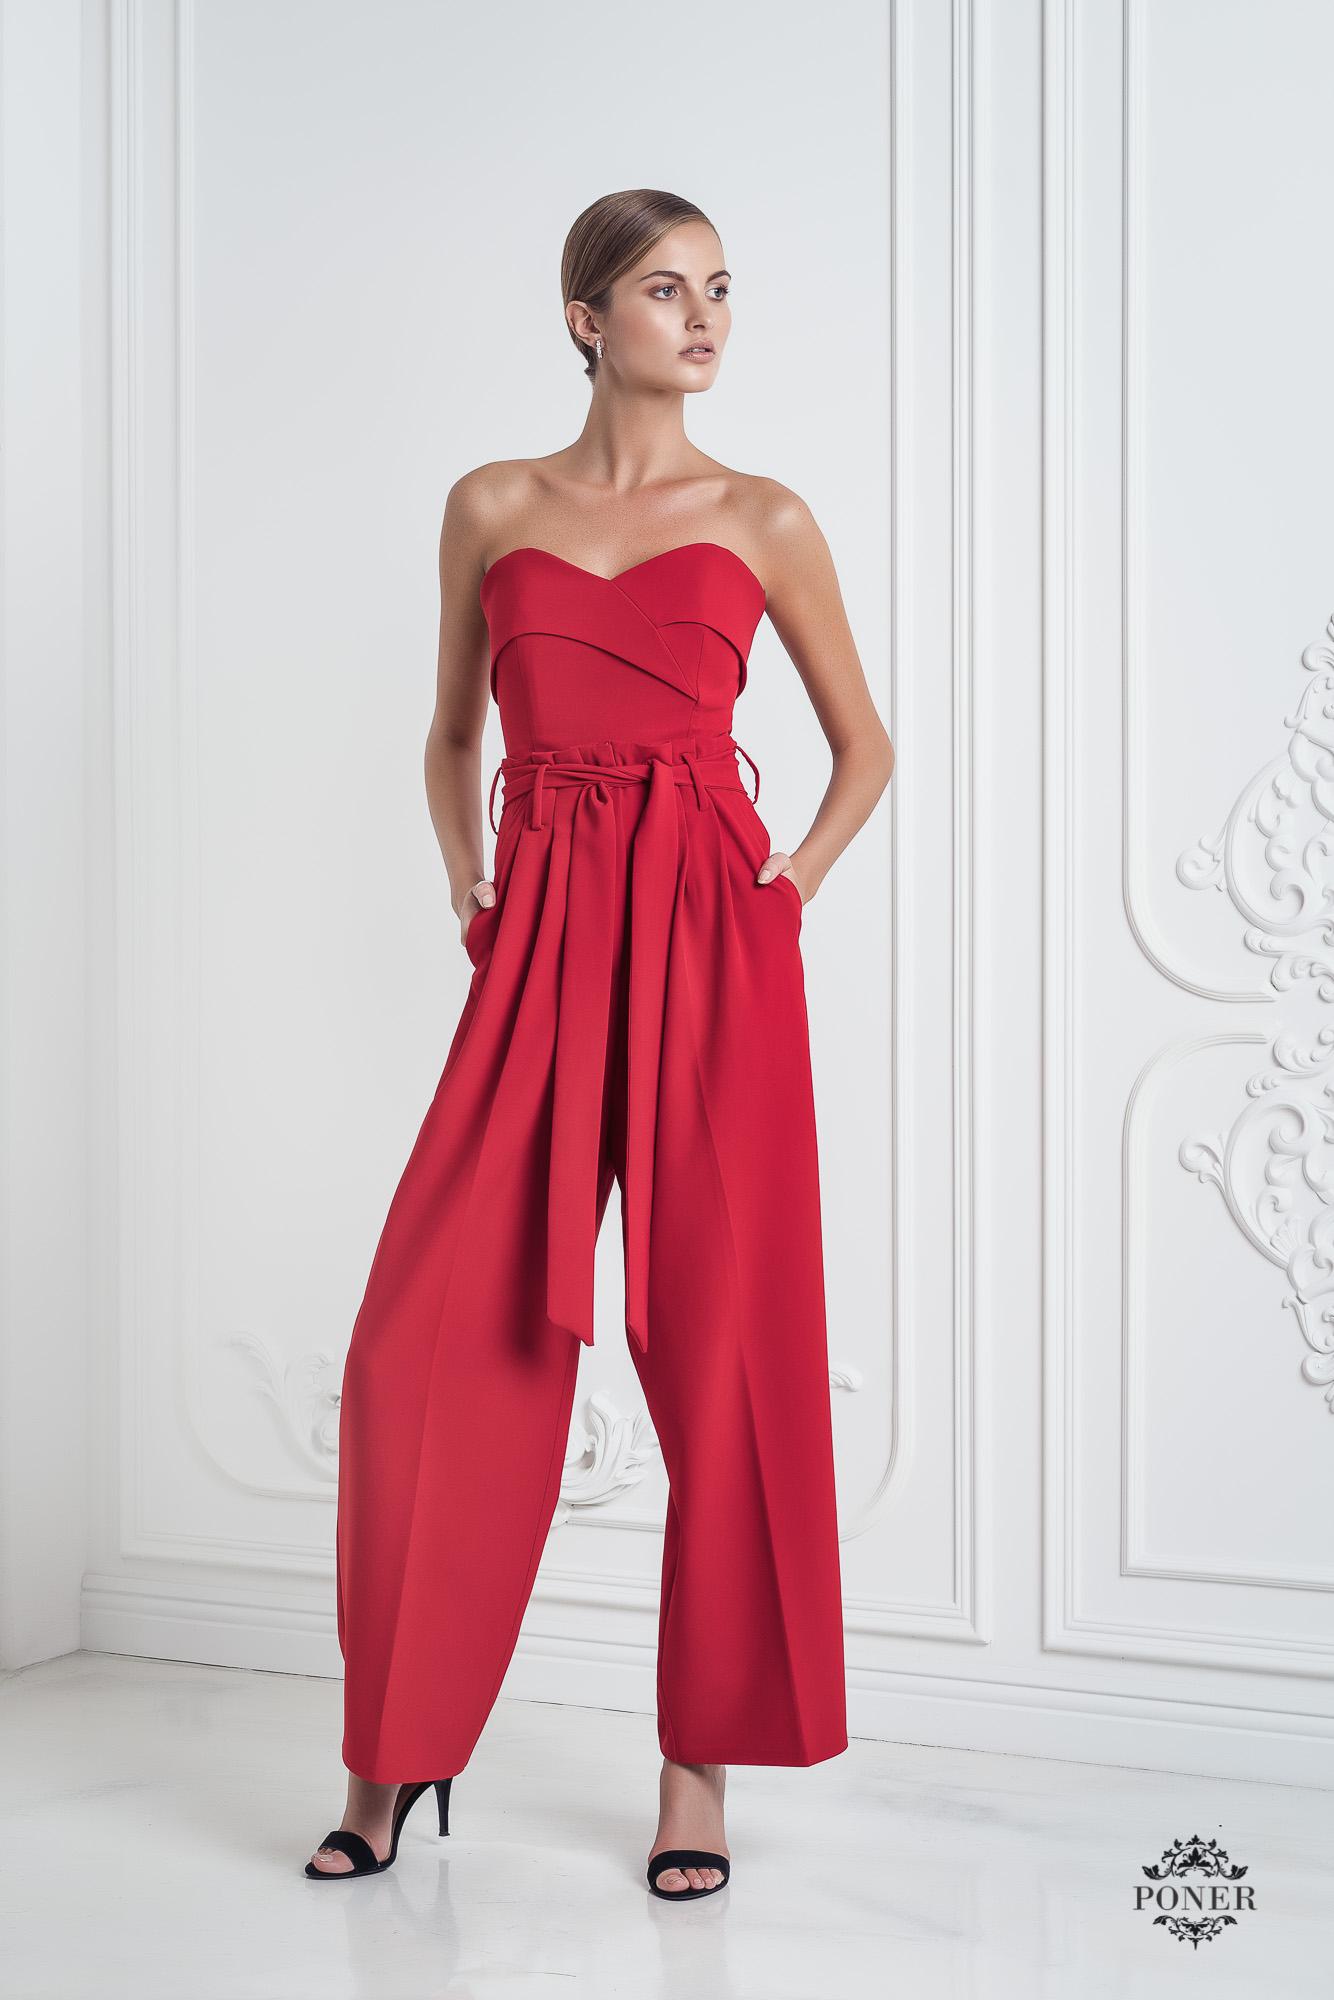 poner-fashion2018 (7)